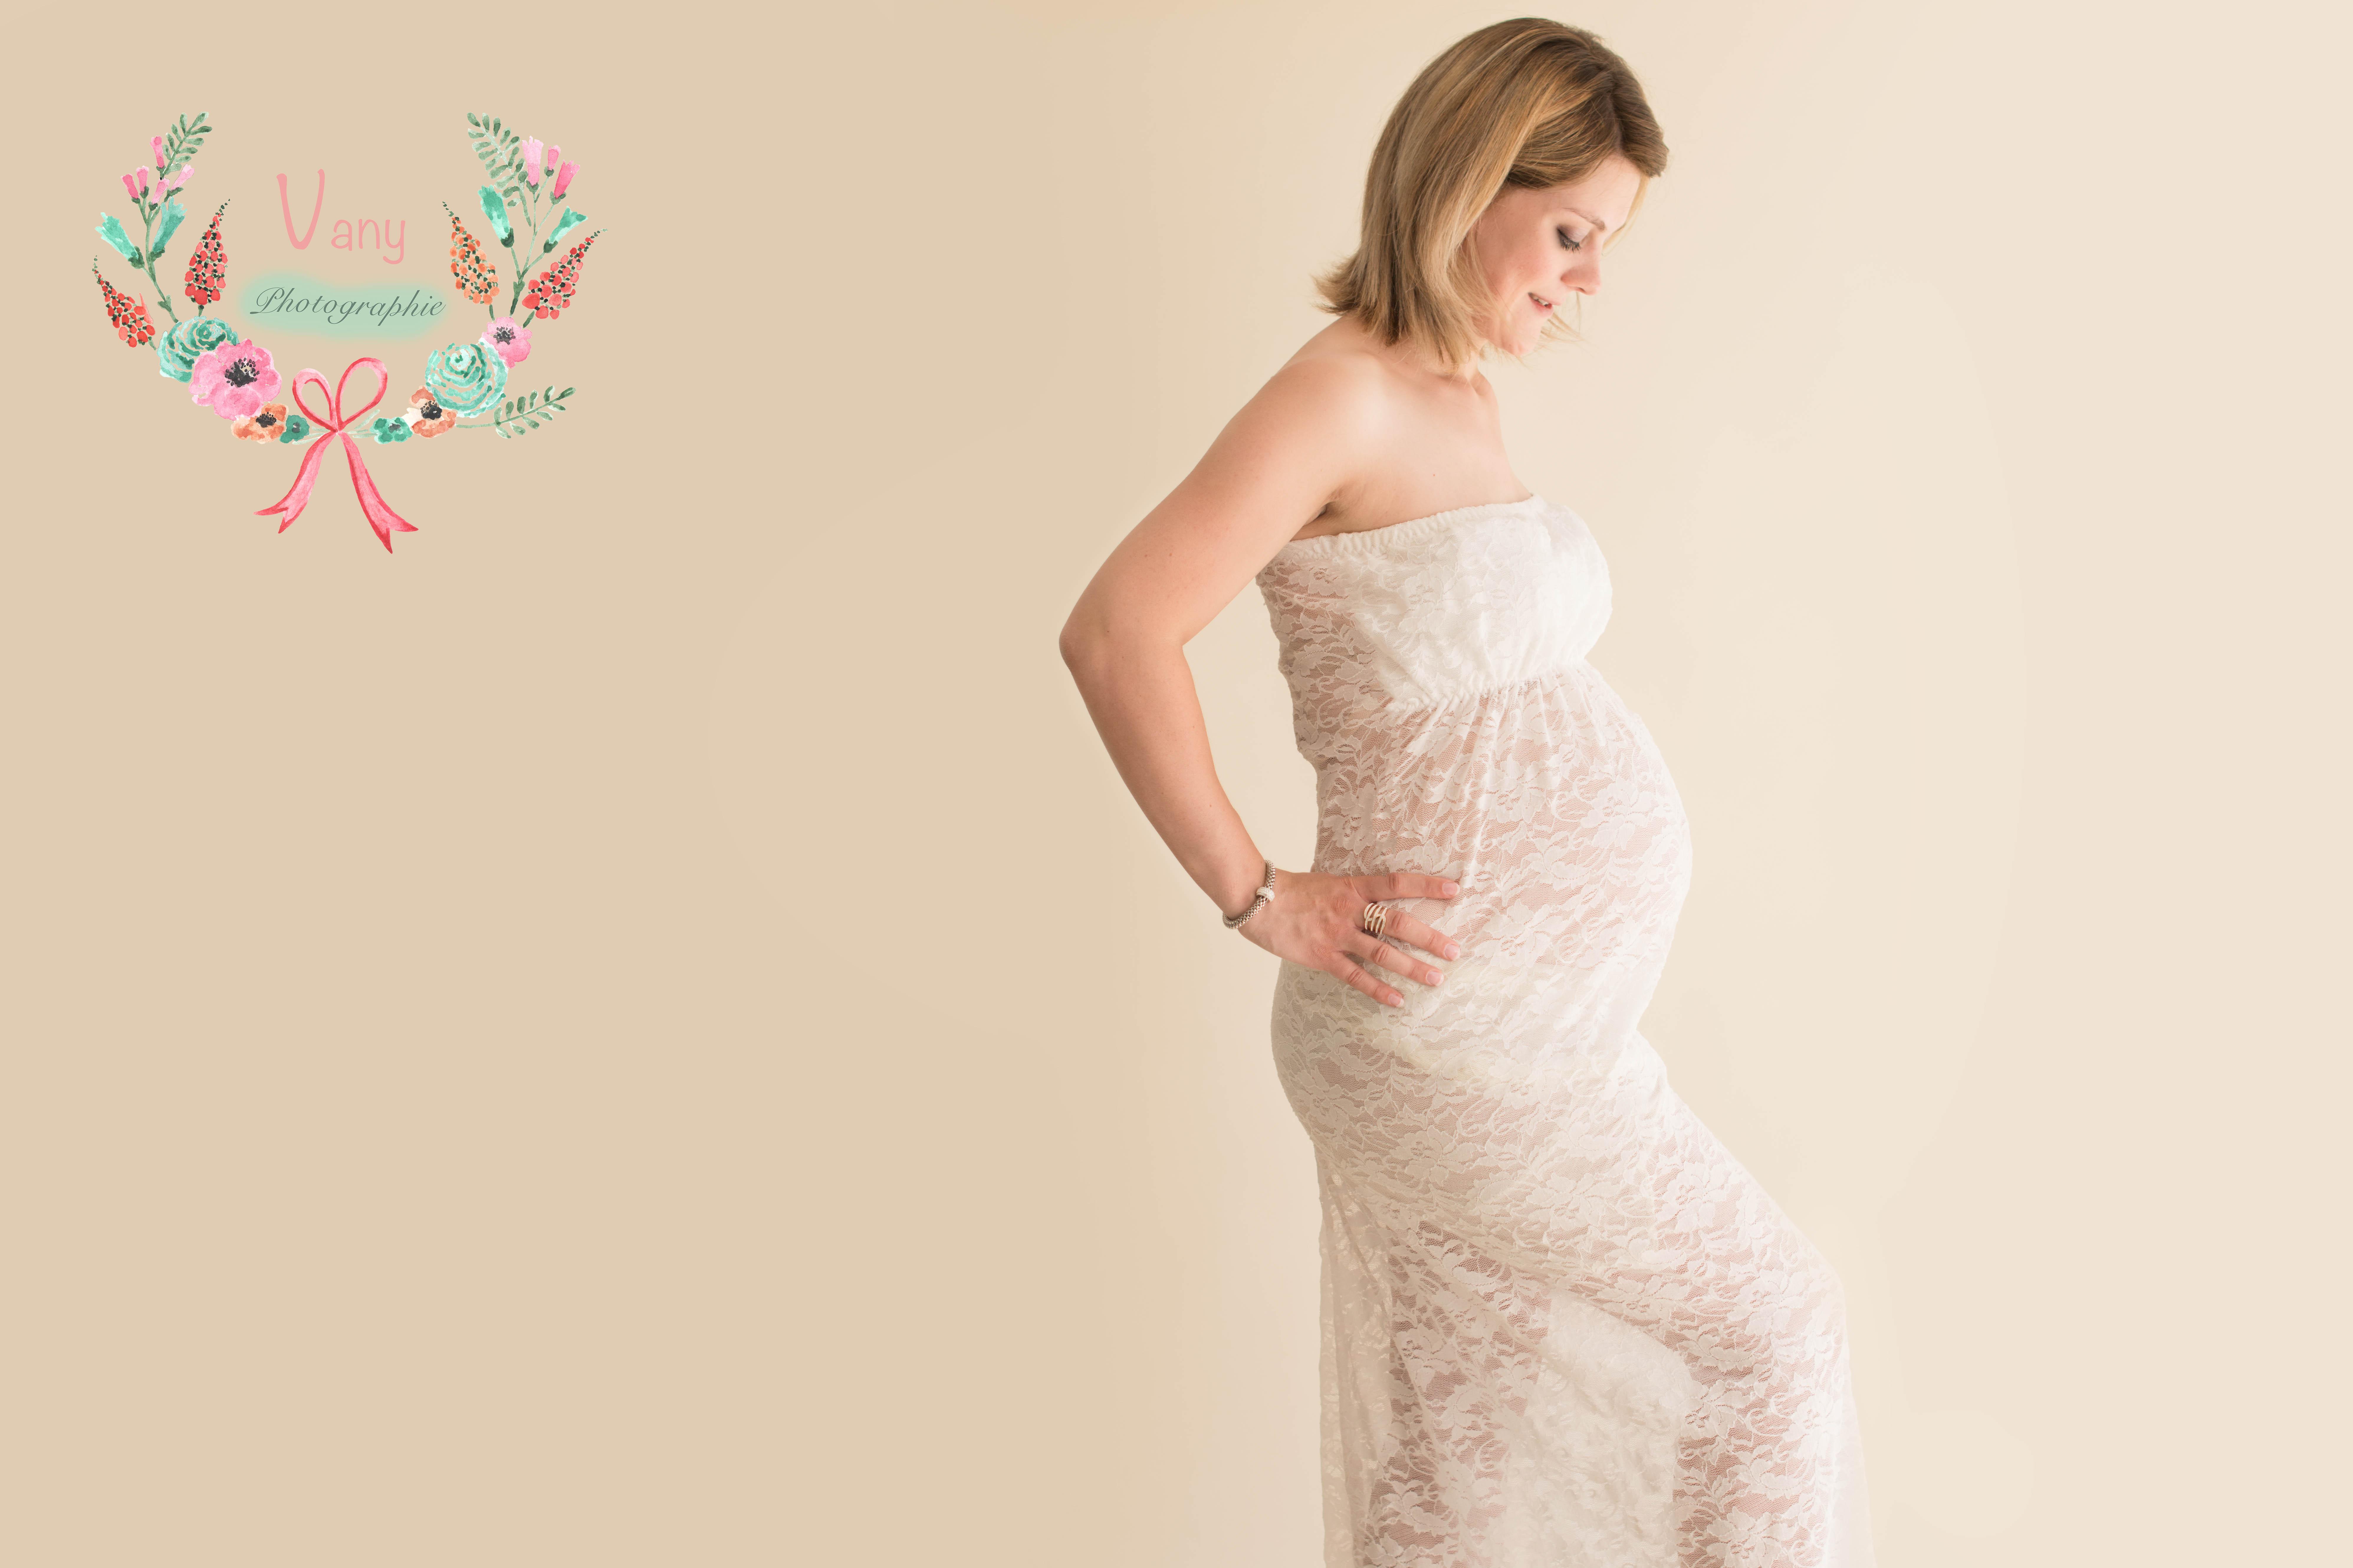 Photographe maternité Mayenne